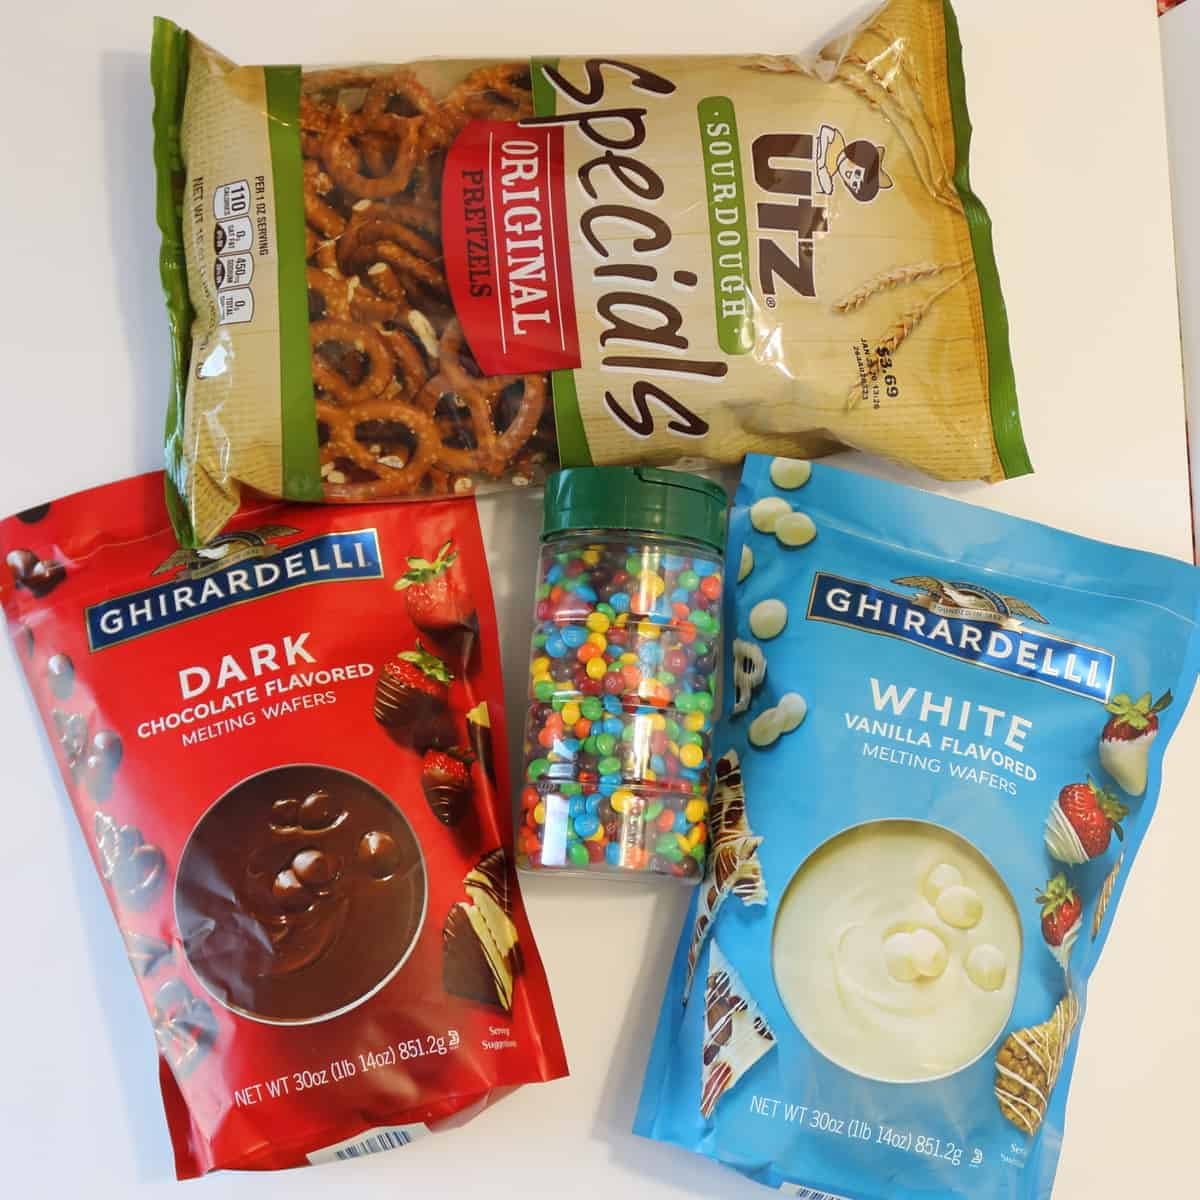 Ghiradelli Dark Chocolate and White Chocolate melting wafers, Utz preztels, and M+Ms